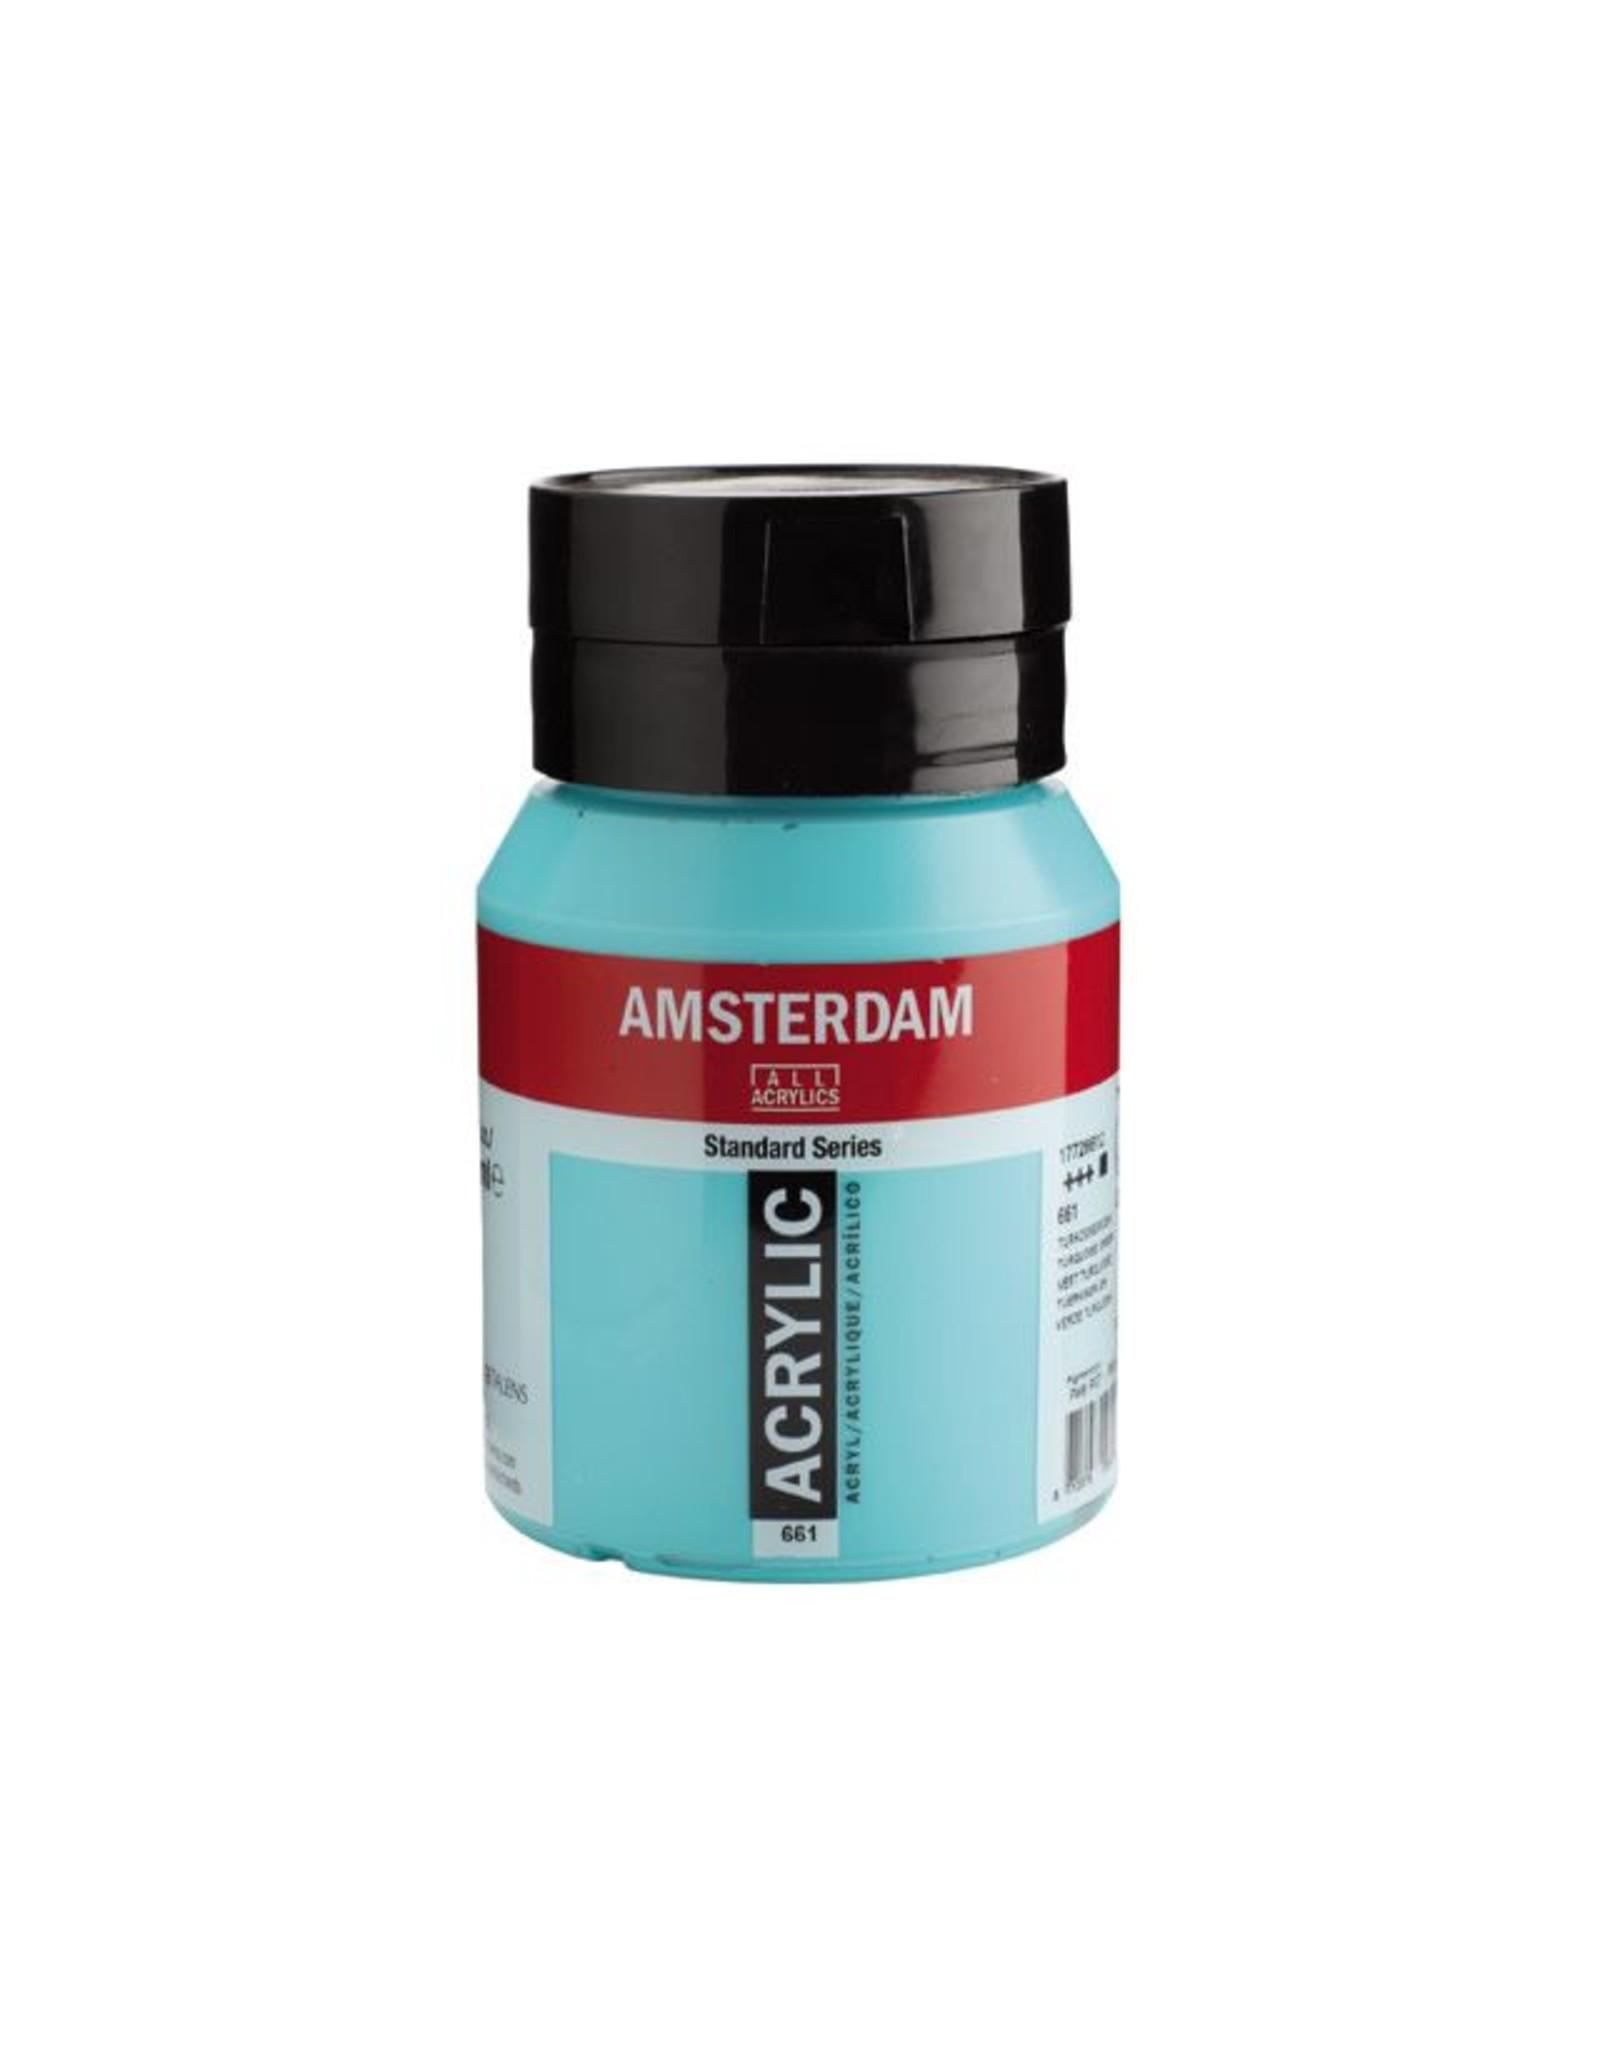 Talens Amsterdam acrylverf Turkooisgroen 500ML